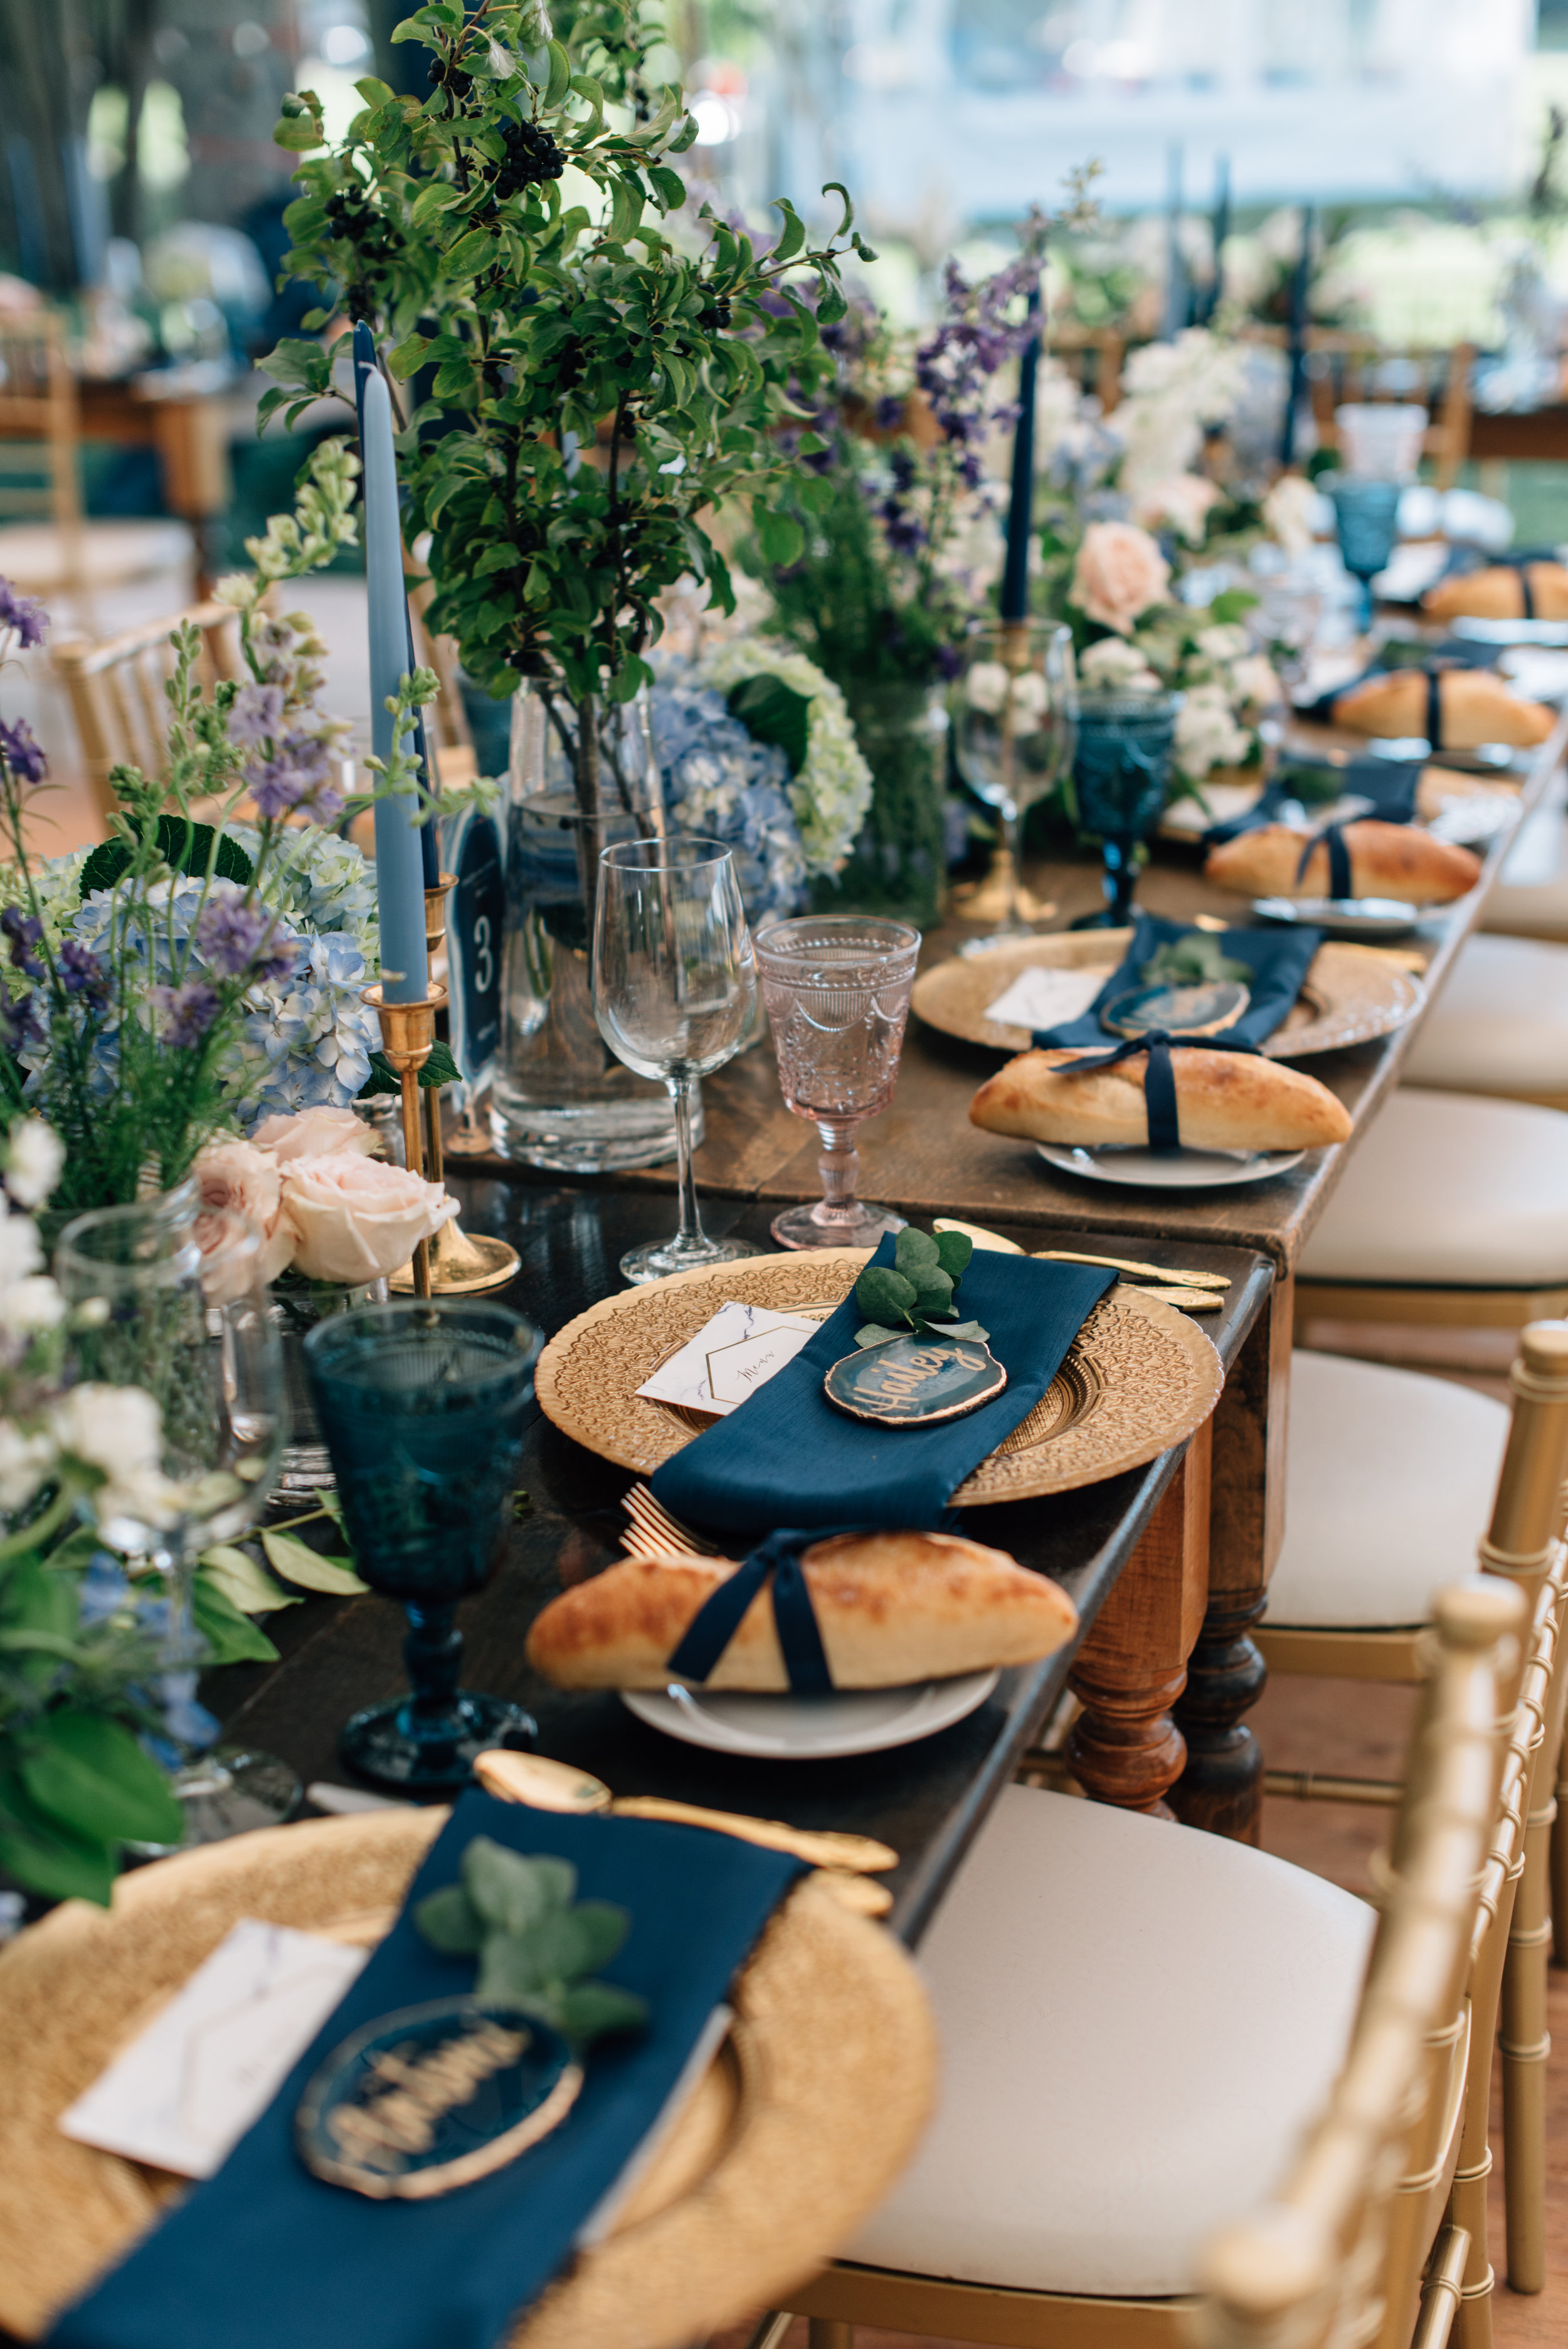 sept-23-wedding-details-lustre-events-sara-wilde-photography-0047.jpg